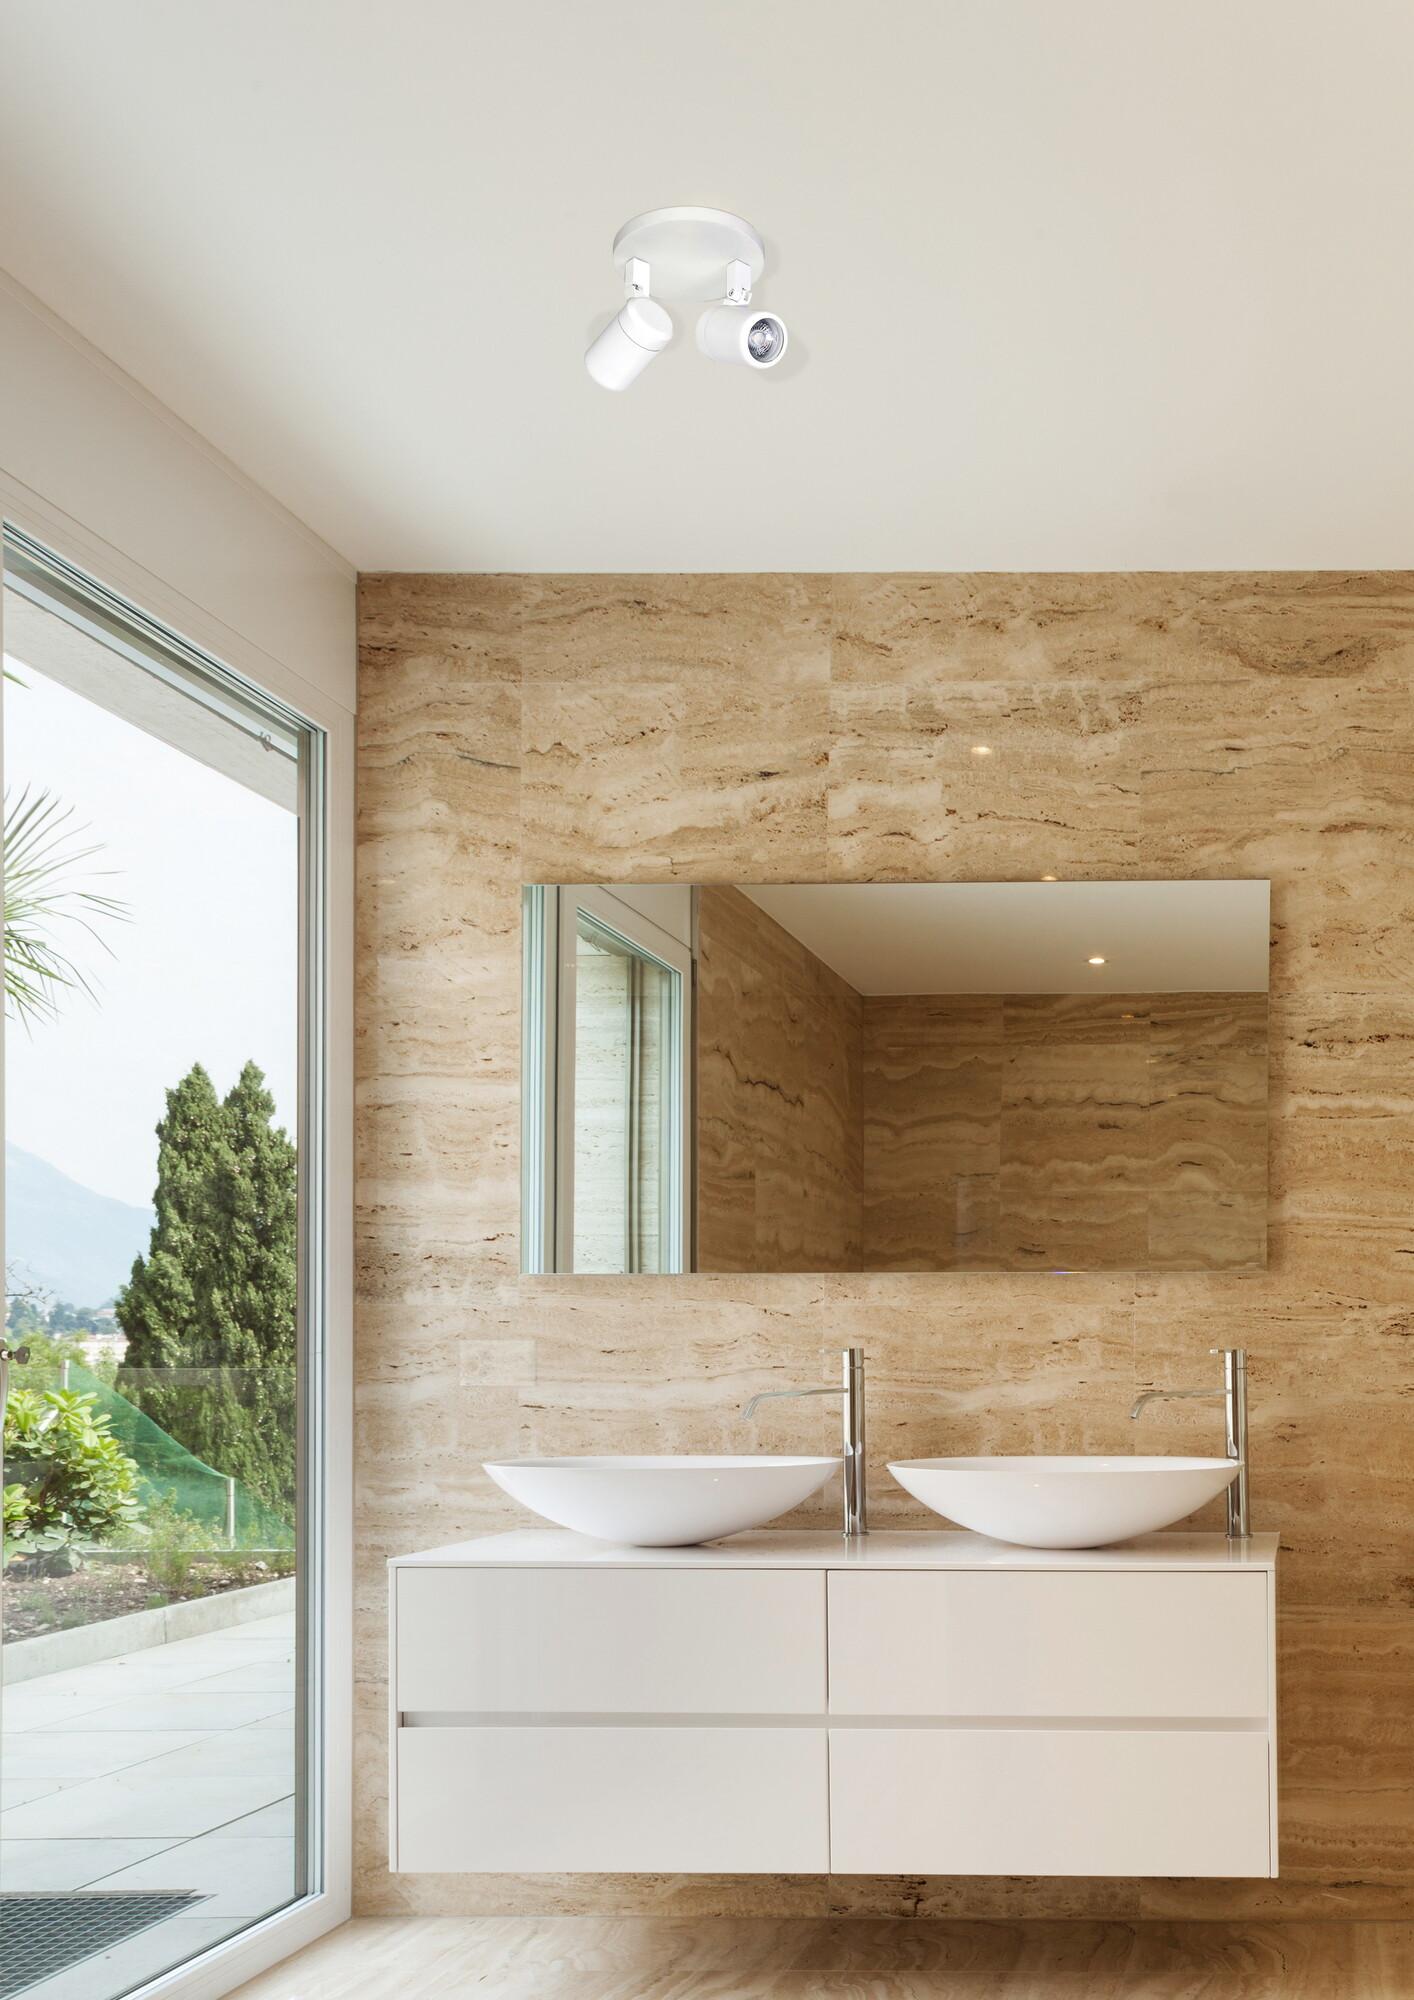 RAIN opbouwspots badkamer